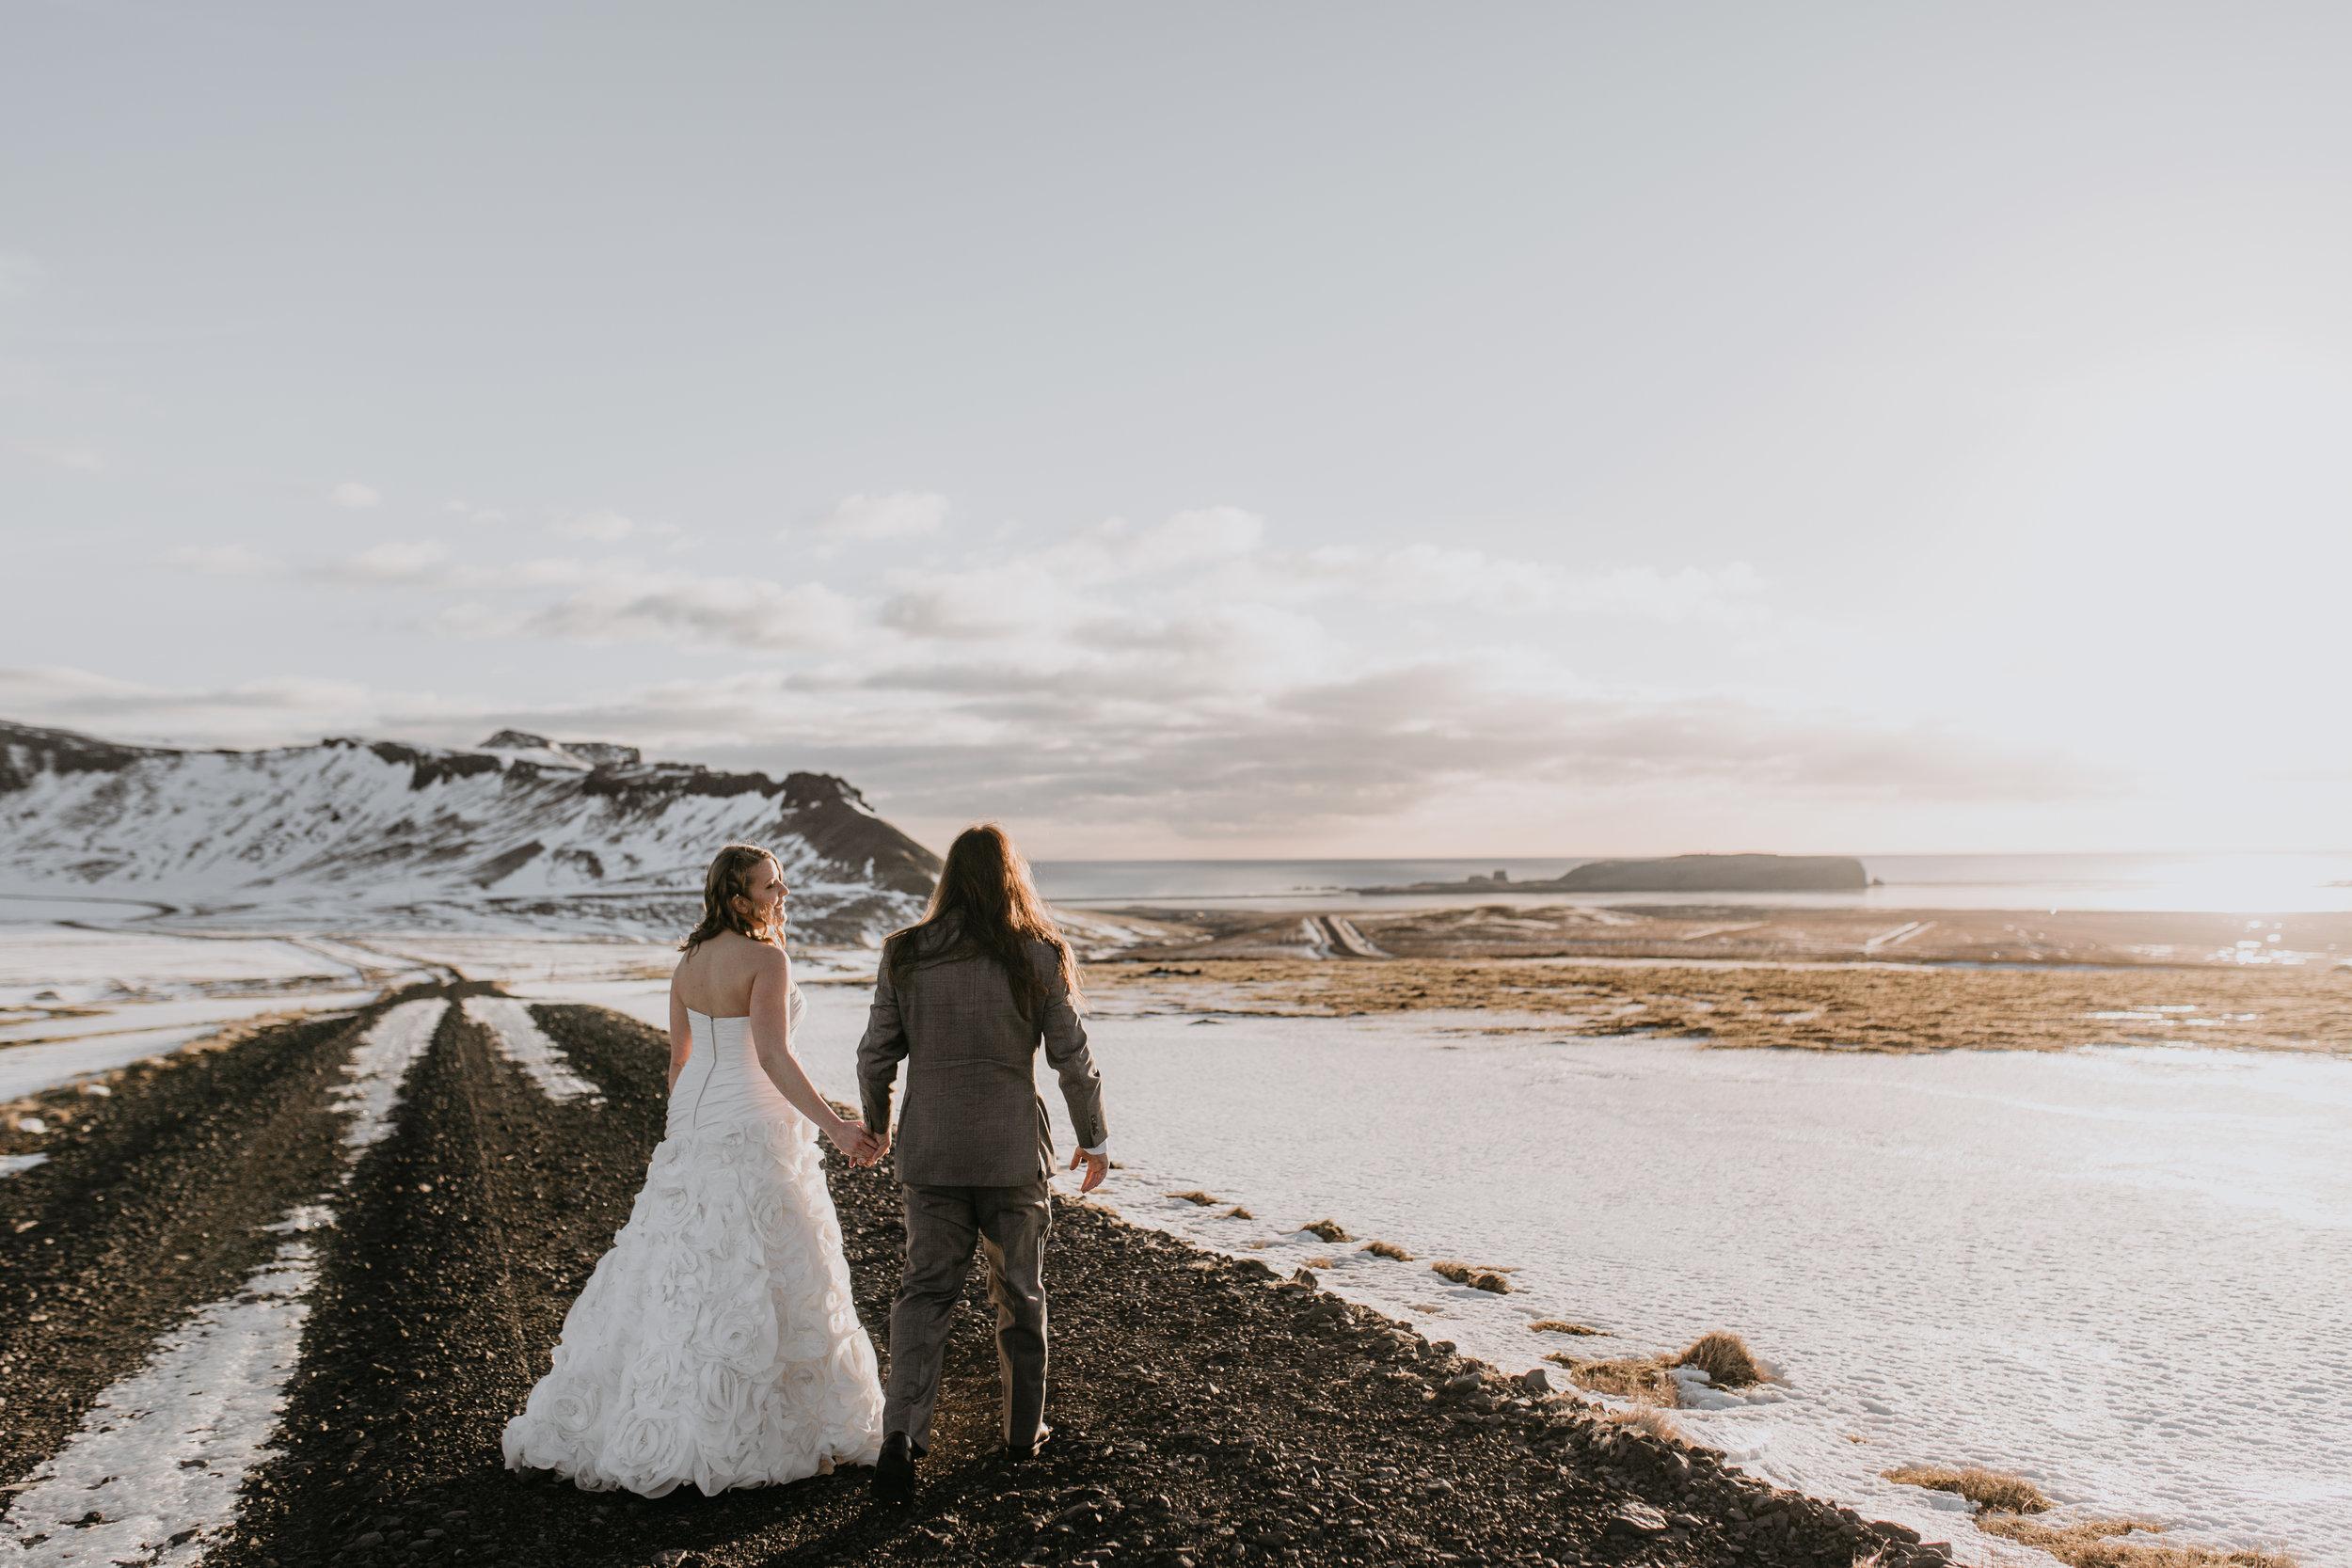 nicole-daacke-photography-iceland-winter-sunset-adventure-elopement-skogafoss-waterfall-black-sand-beach-dyrholaey-vik-iceland-intimate-wedding-black-church-elopement-photographer-13.jpg